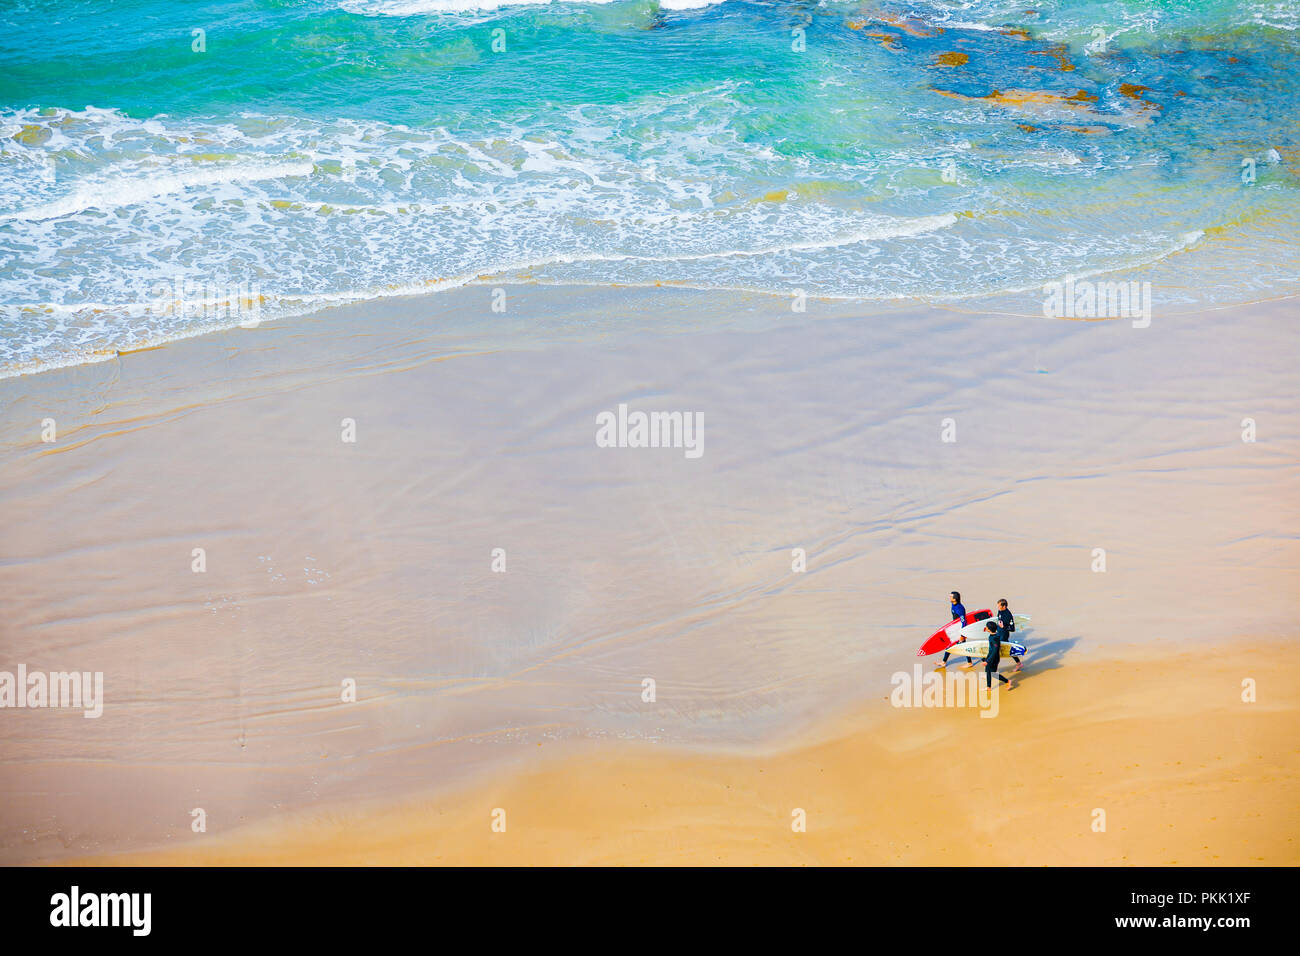 Bird's-eye overhead view of three surfers walking along sandy beach - Stock Image